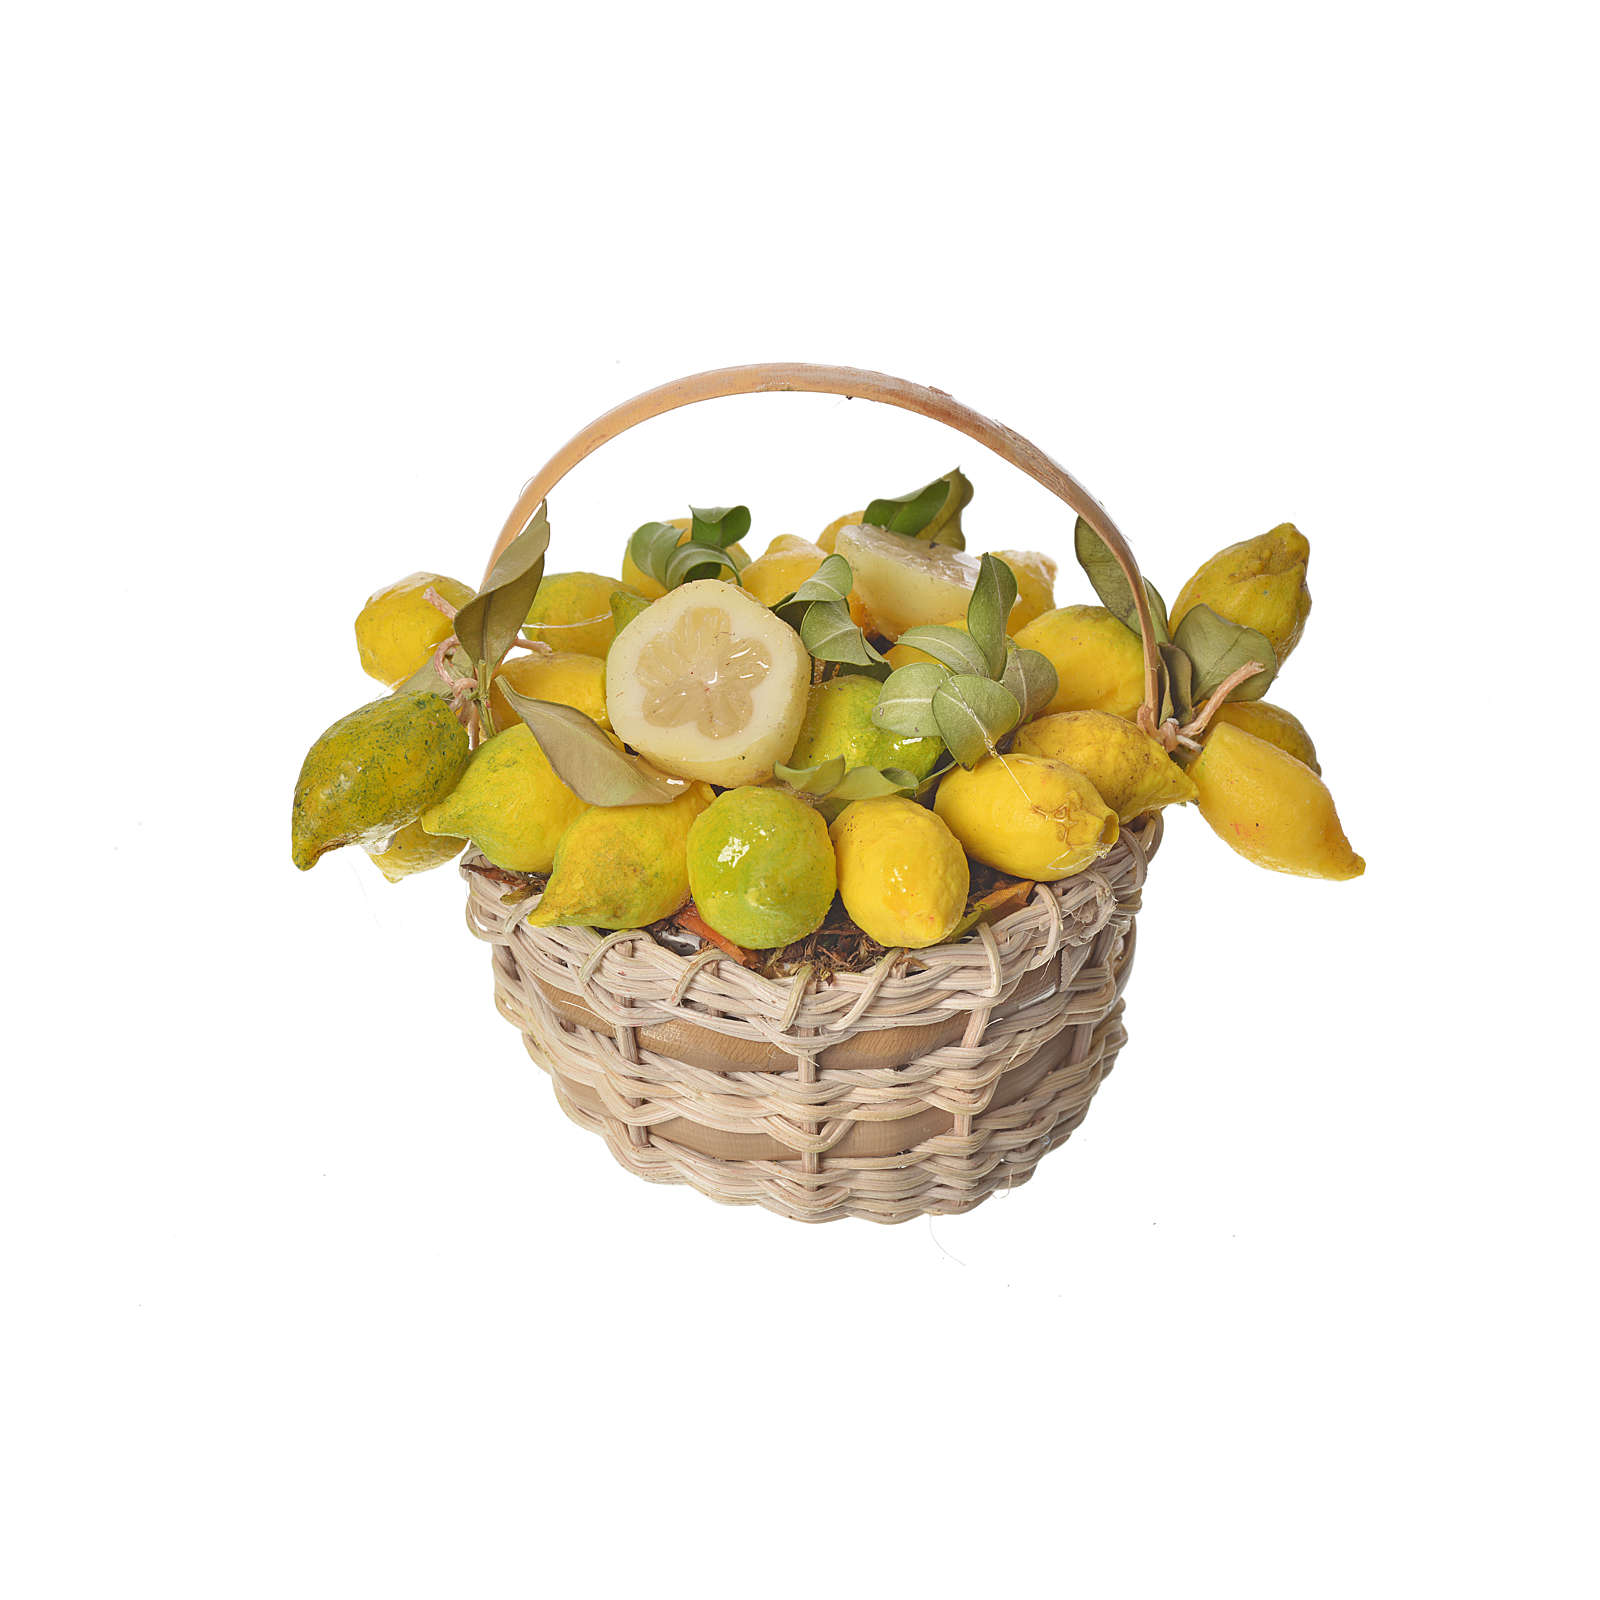 Nativity accessory, lemon basket in wax, 10x7x8cm 4